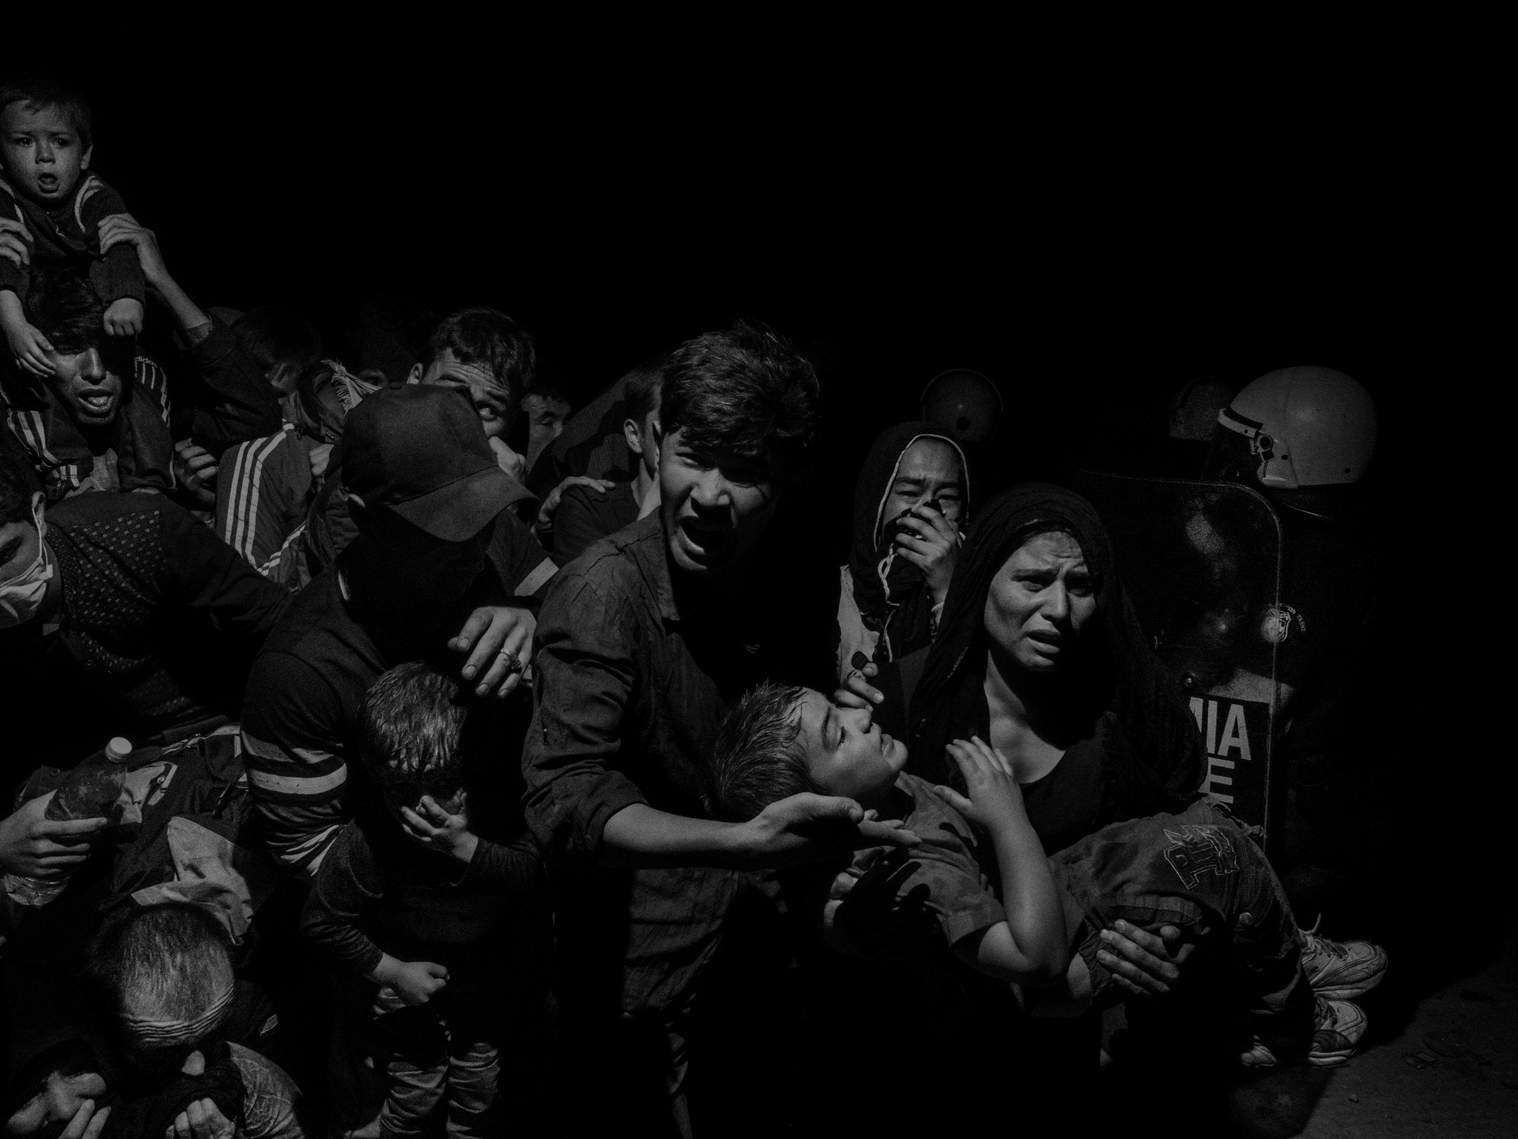 Scene #60410, Lesbos, Greece, 2015